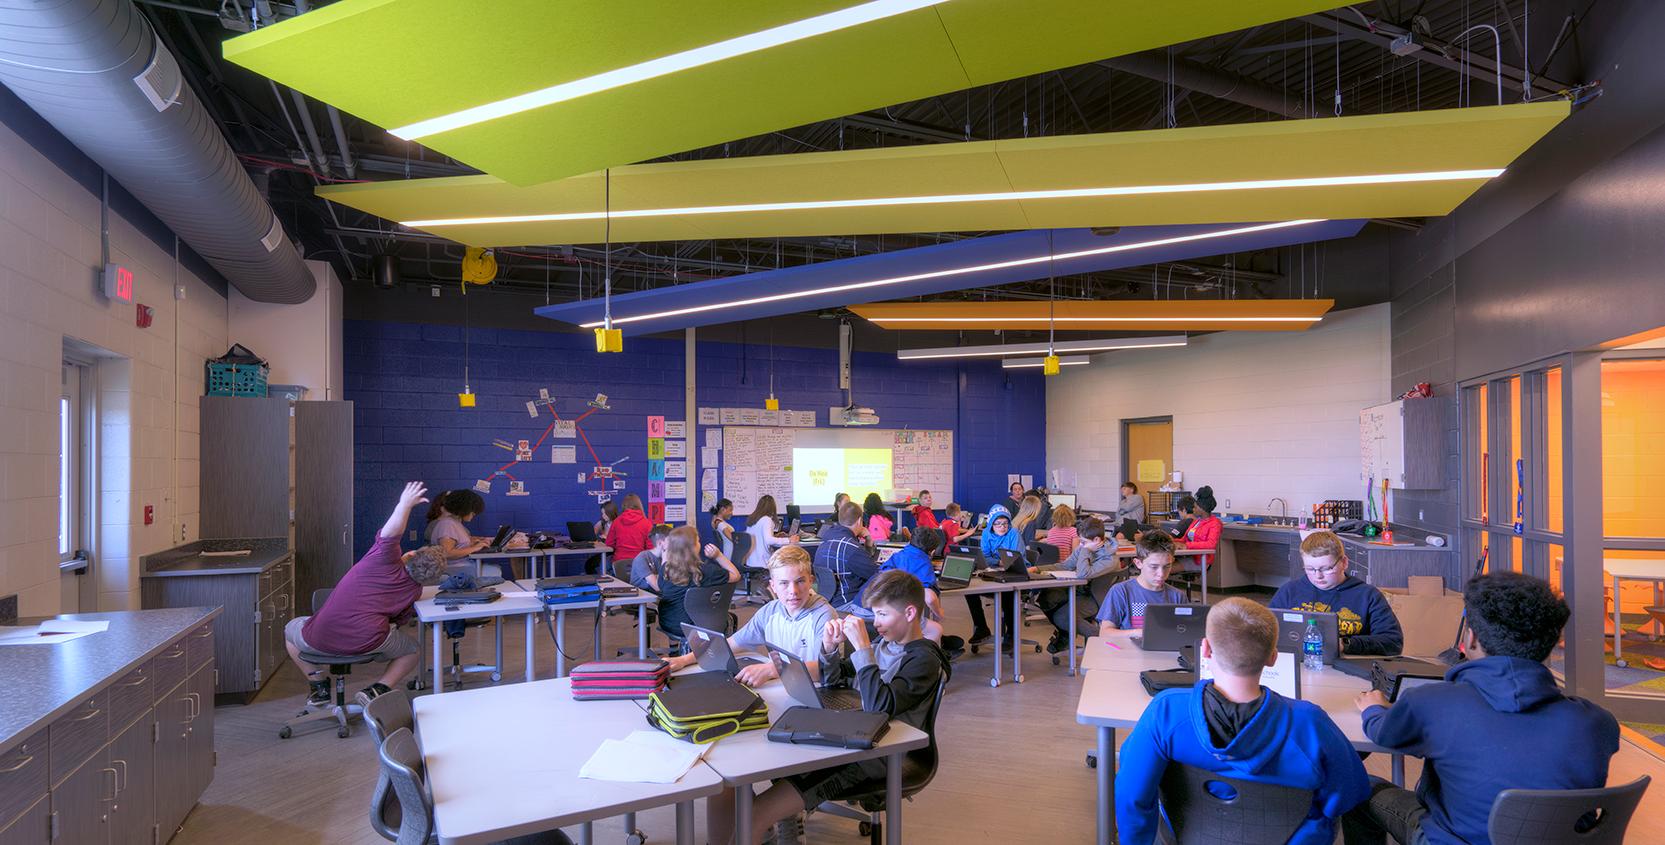 Port-Huron-Northern-High-School-Renovation-Classroom-7-1665x845